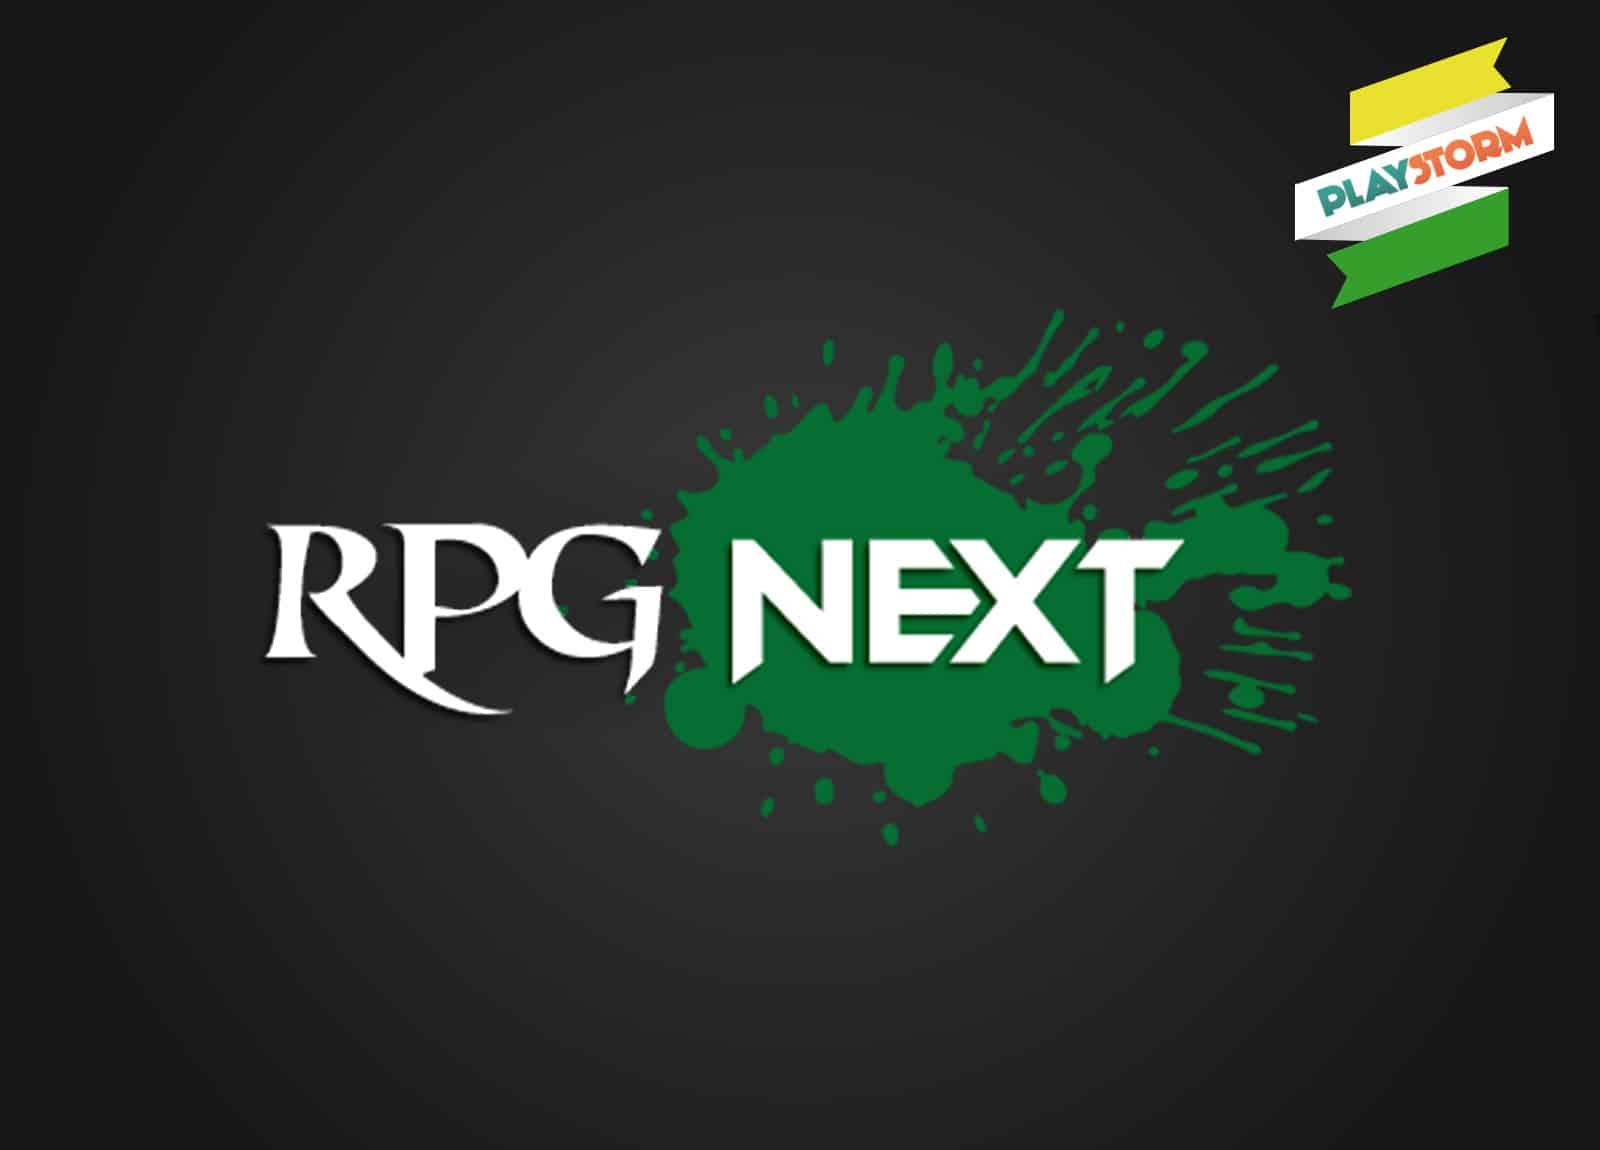 RPG Next - Tarrasque na Bota